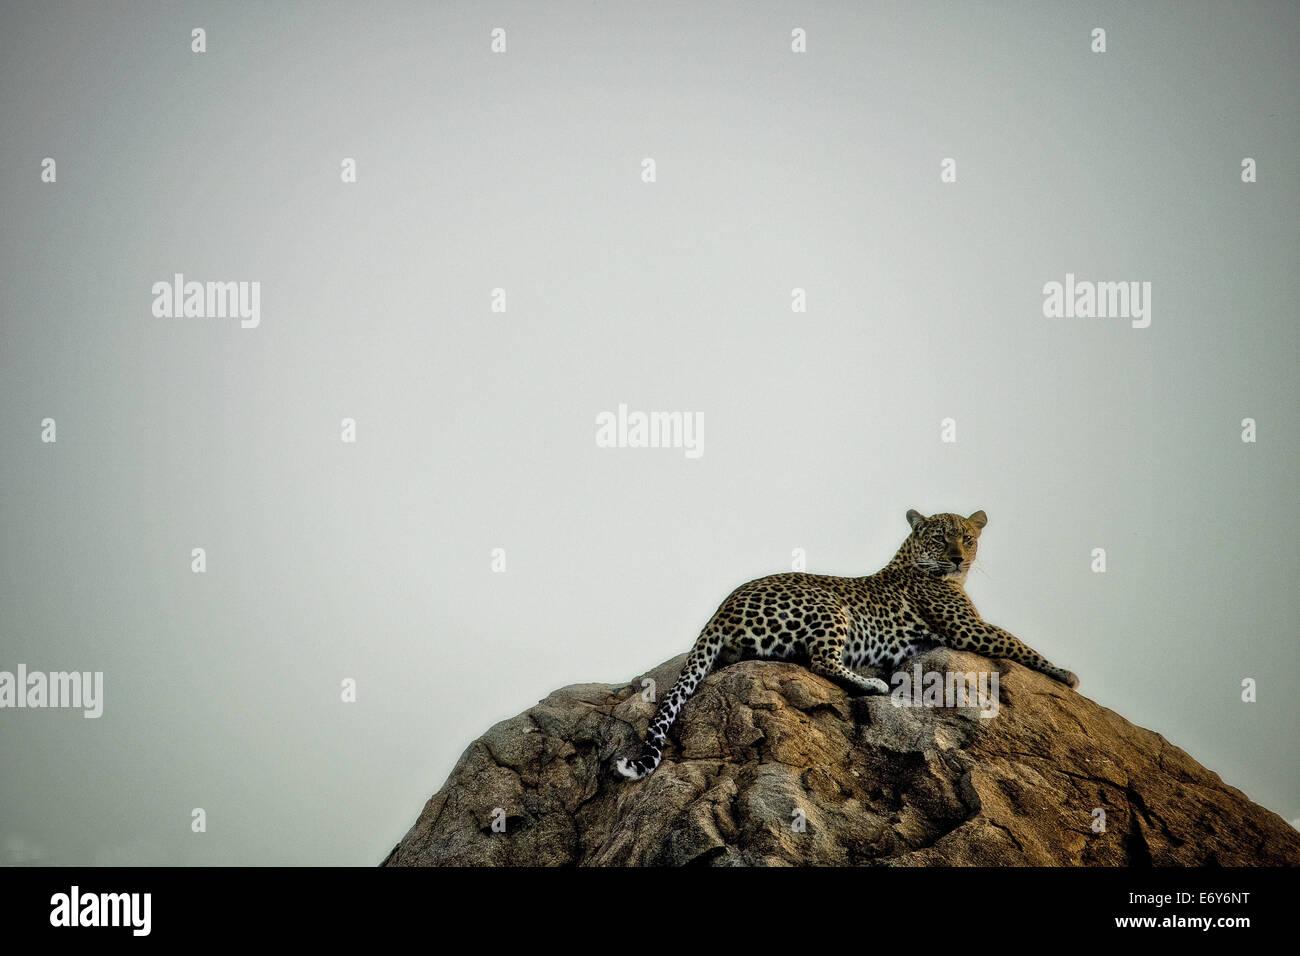 Leopardo descansa sobre una roca, Sabi Sands Game Reserve, Sudáfrica, África Foto de stock